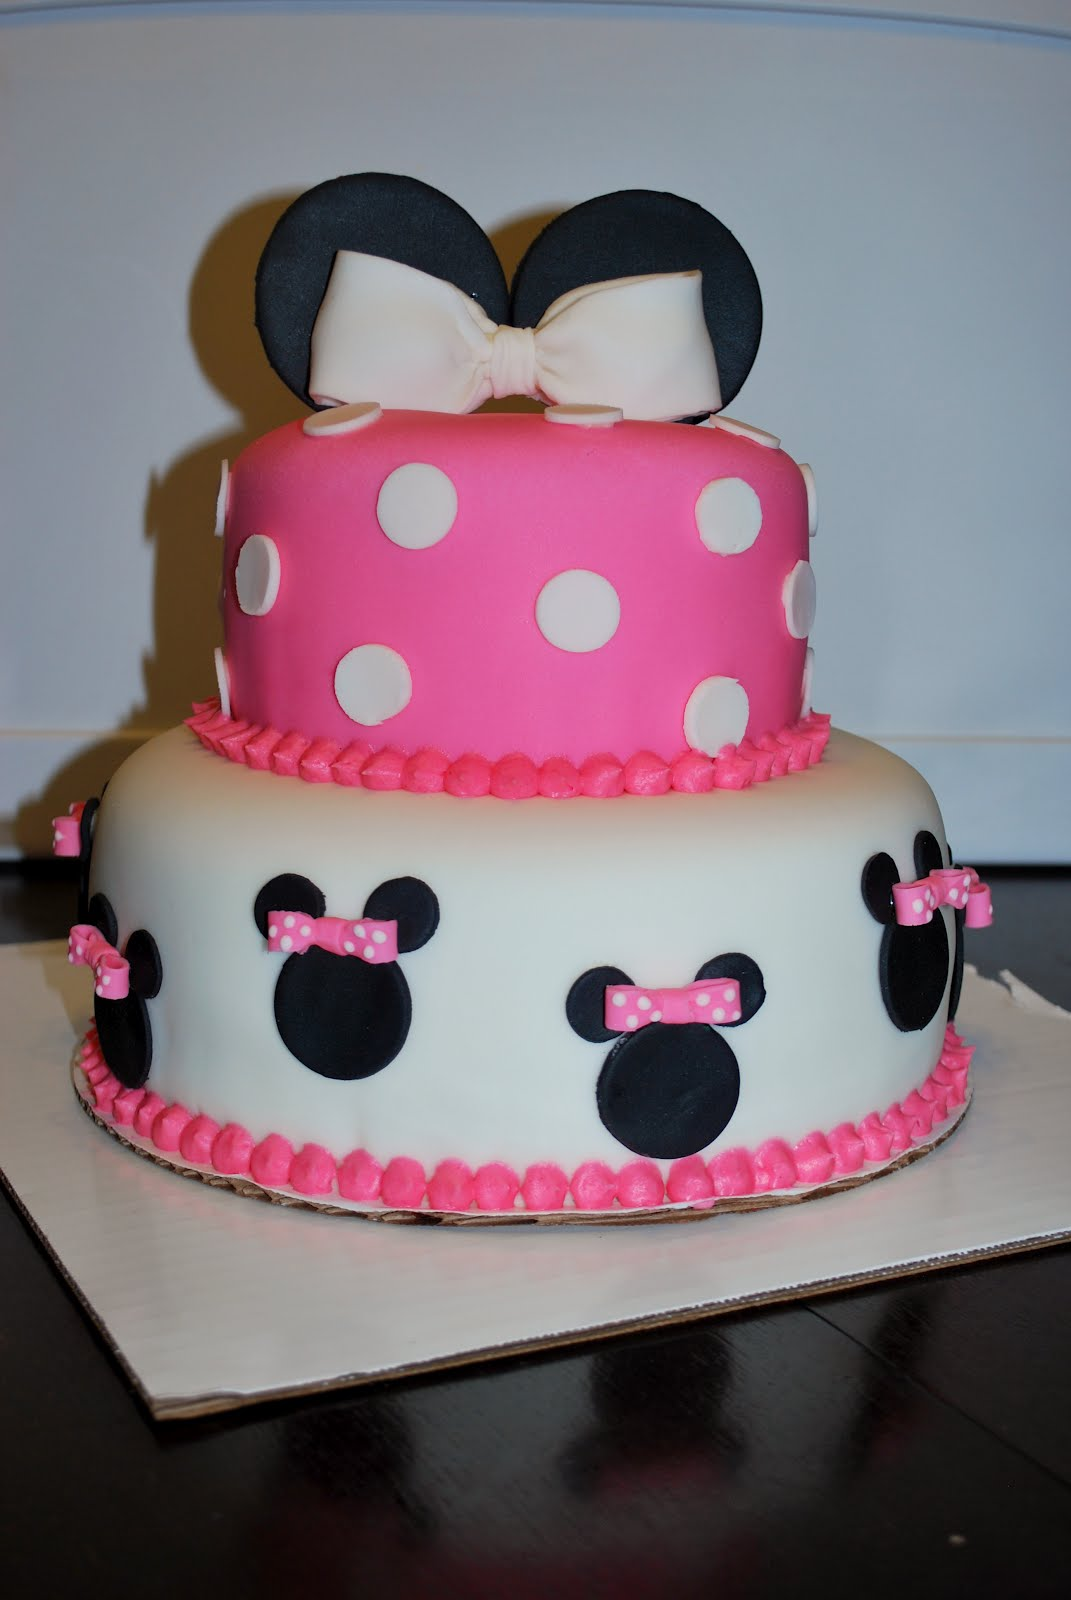 Astounding 9 2 Year Old Birthday Cakes For Girls Photo Abby Cakes Birthday Personalised Birthday Cards Arneslily Jamesorg